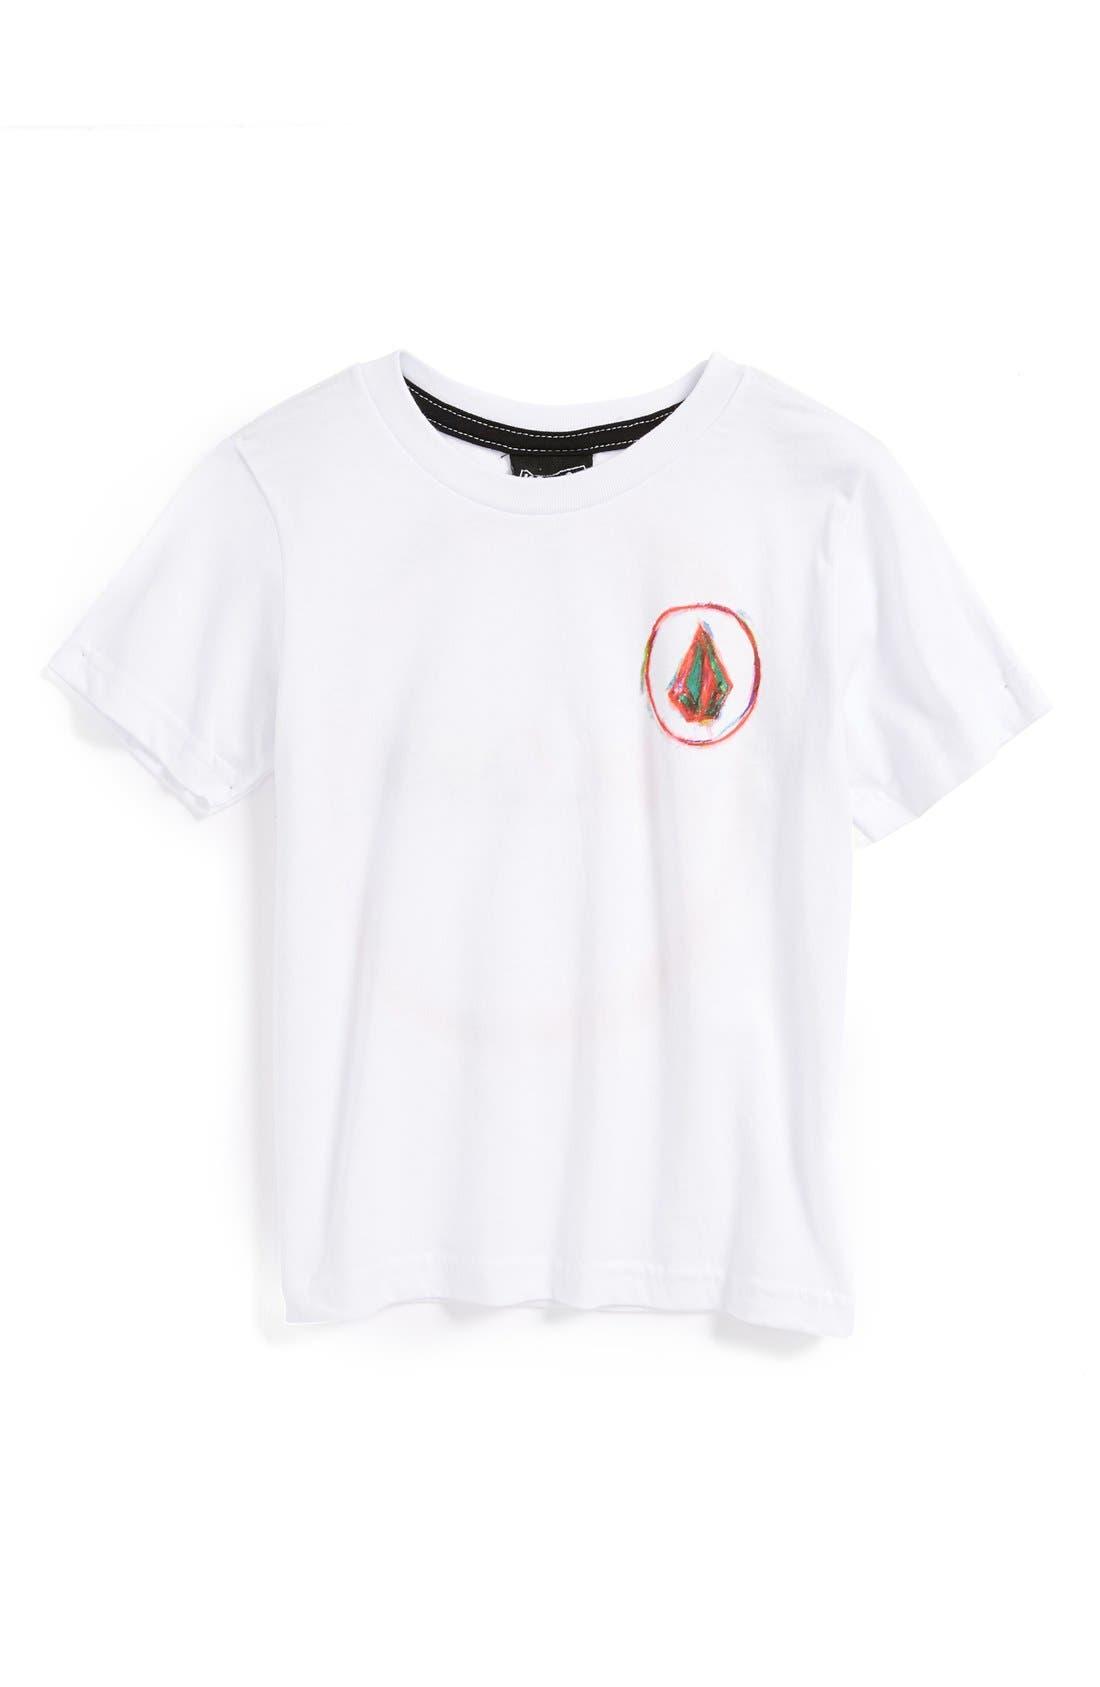 Main Image - Volcom 'Ojas' T-Shirt (Toddler Boys)